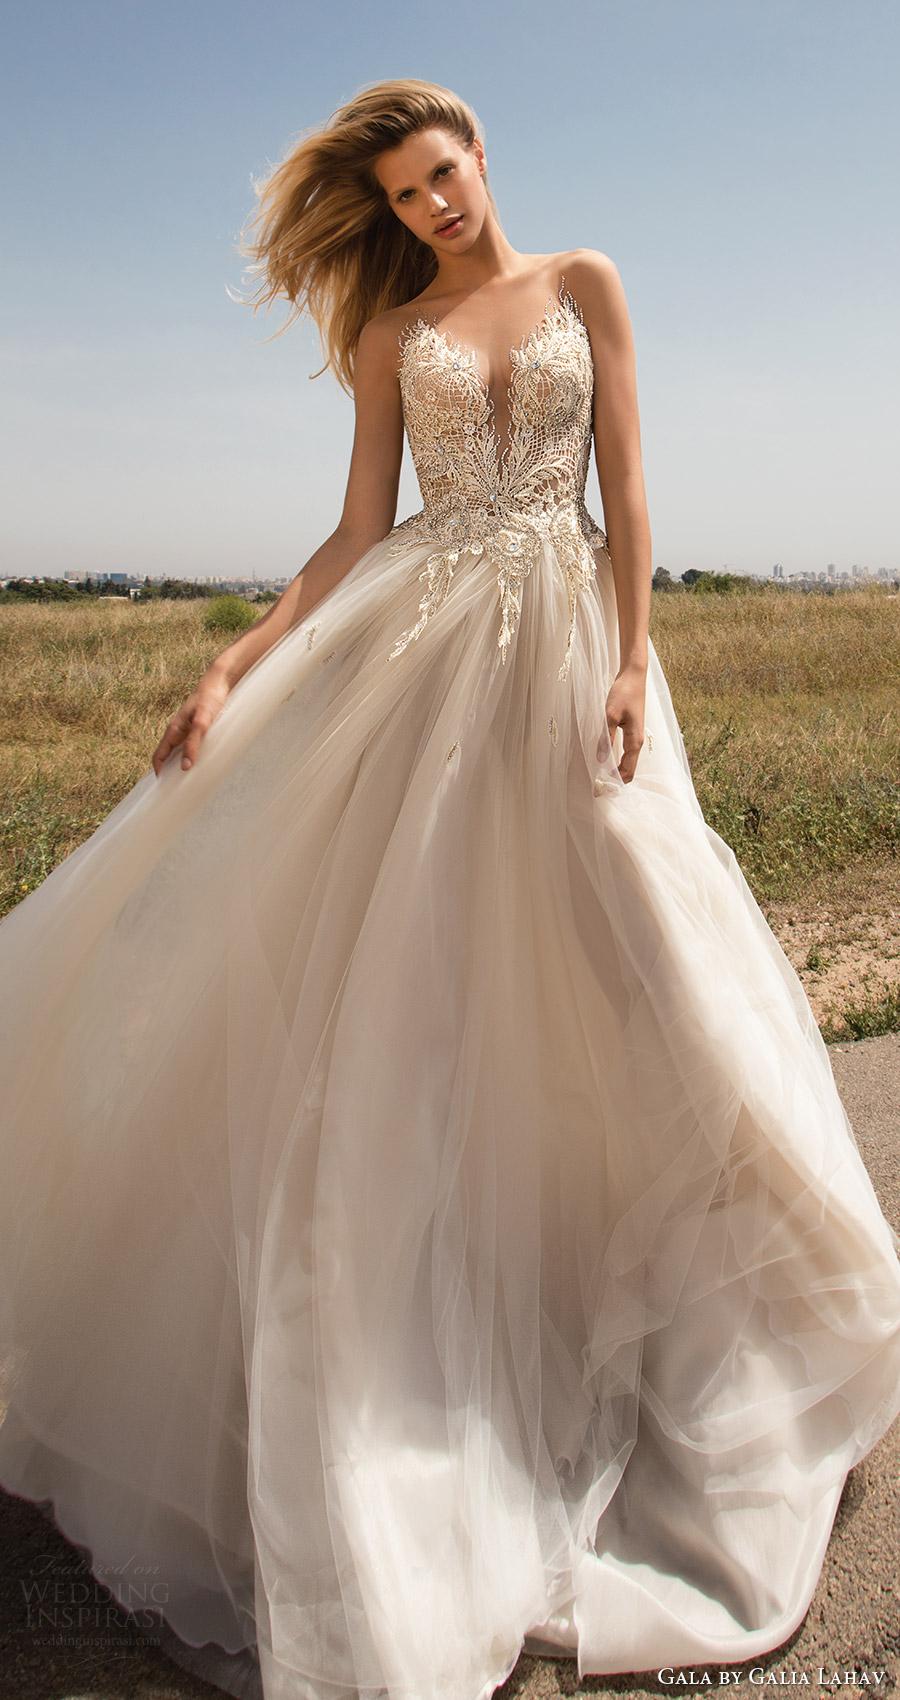 primavera Lahav vestido de boda del amor aline gala galia 2017 sin mangas de la blusa embellecida ilusión (706) mv